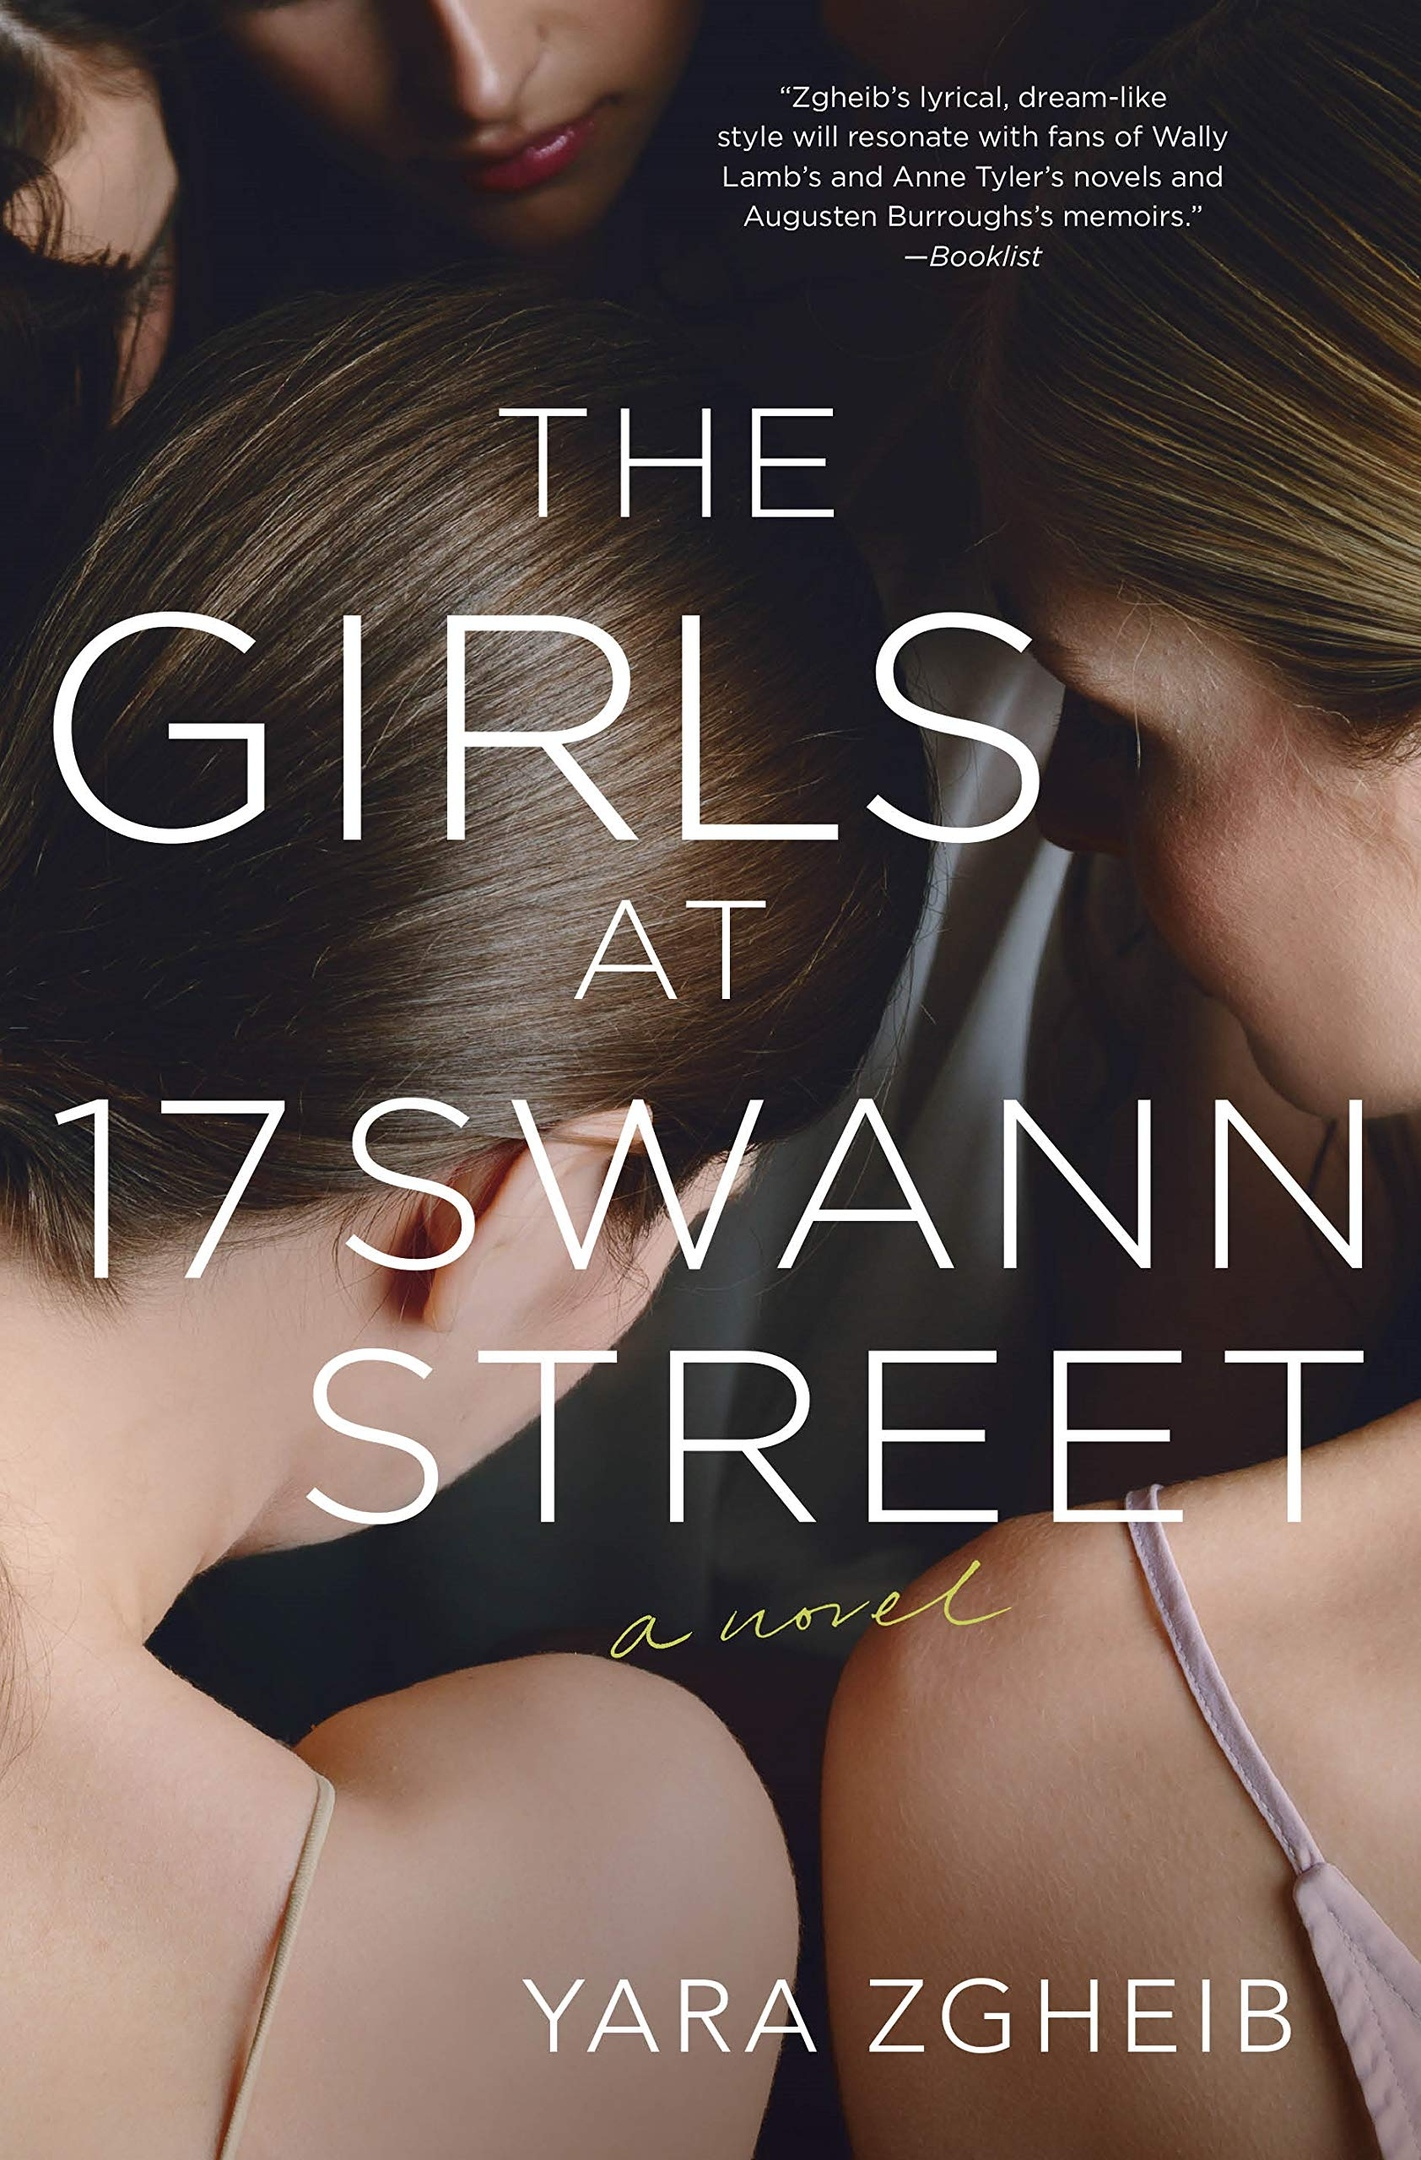 Yara Zgheib – The Girls At 17 Swann Street